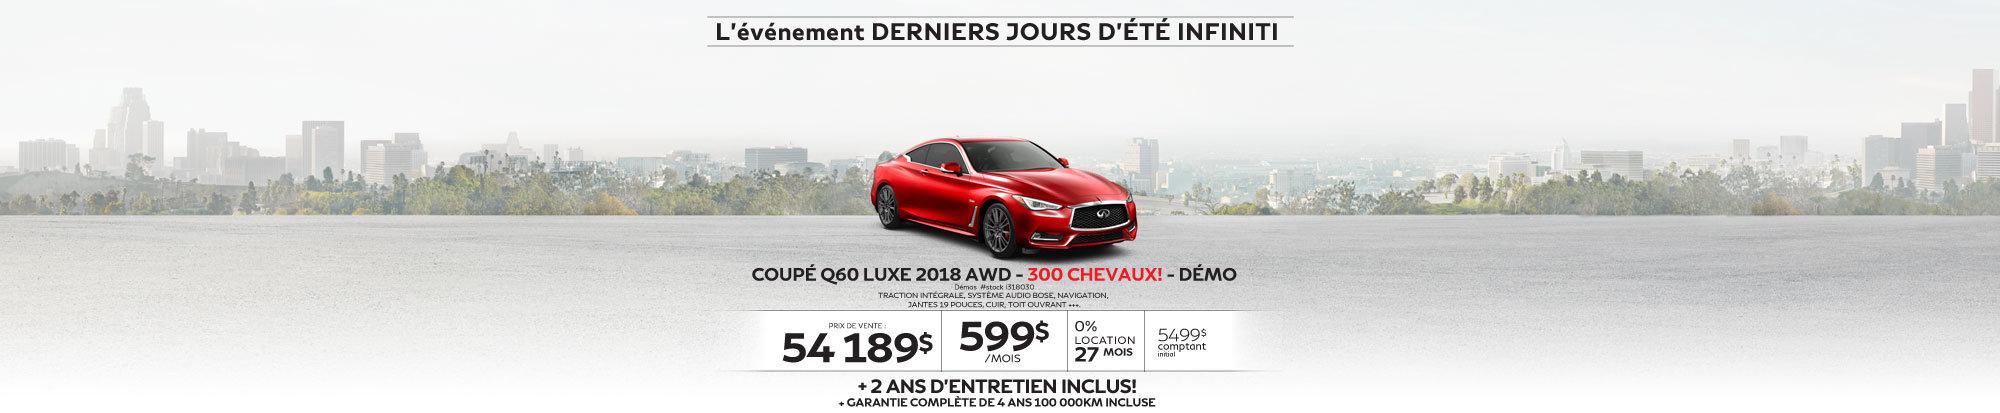 COUPÉ Q60 LUXE 2018 AWD 300 CHEVAUX! Démos web